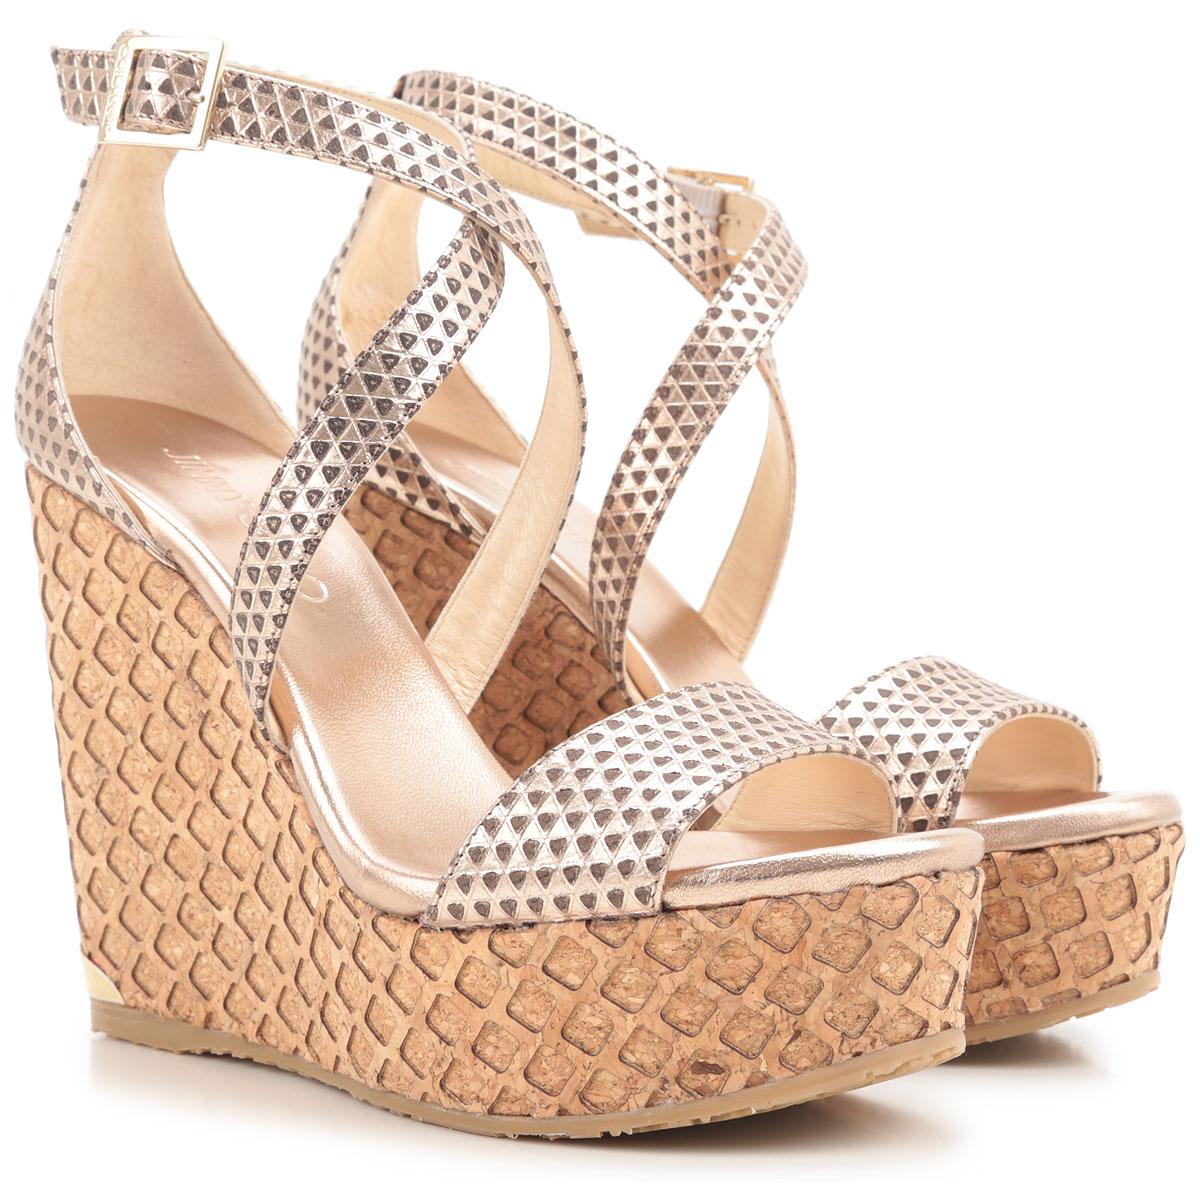 chaussures femme jimmy choo code produit portia 120. Black Bedroom Furniture Sets. Home Design Ideas